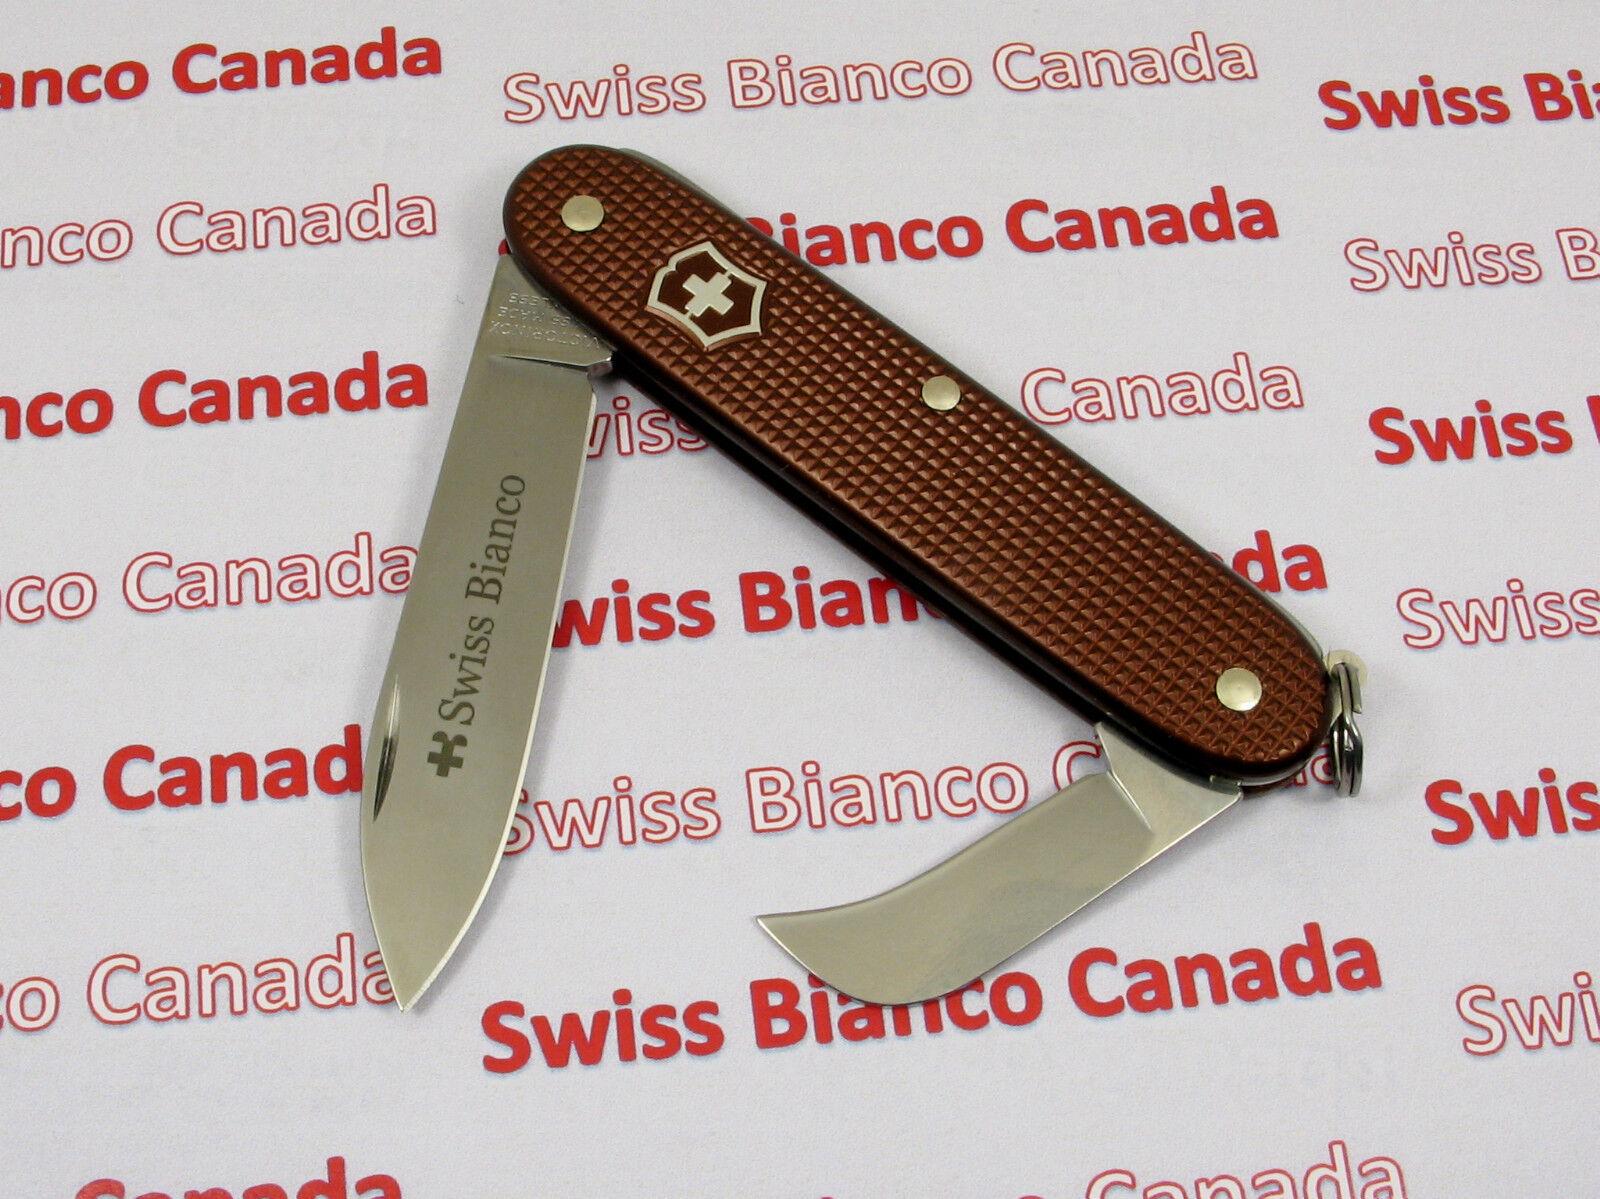 Swiss Bianco Exclusive Victorinox Pruner Chocolate Brown Alox Swiss Army Knife